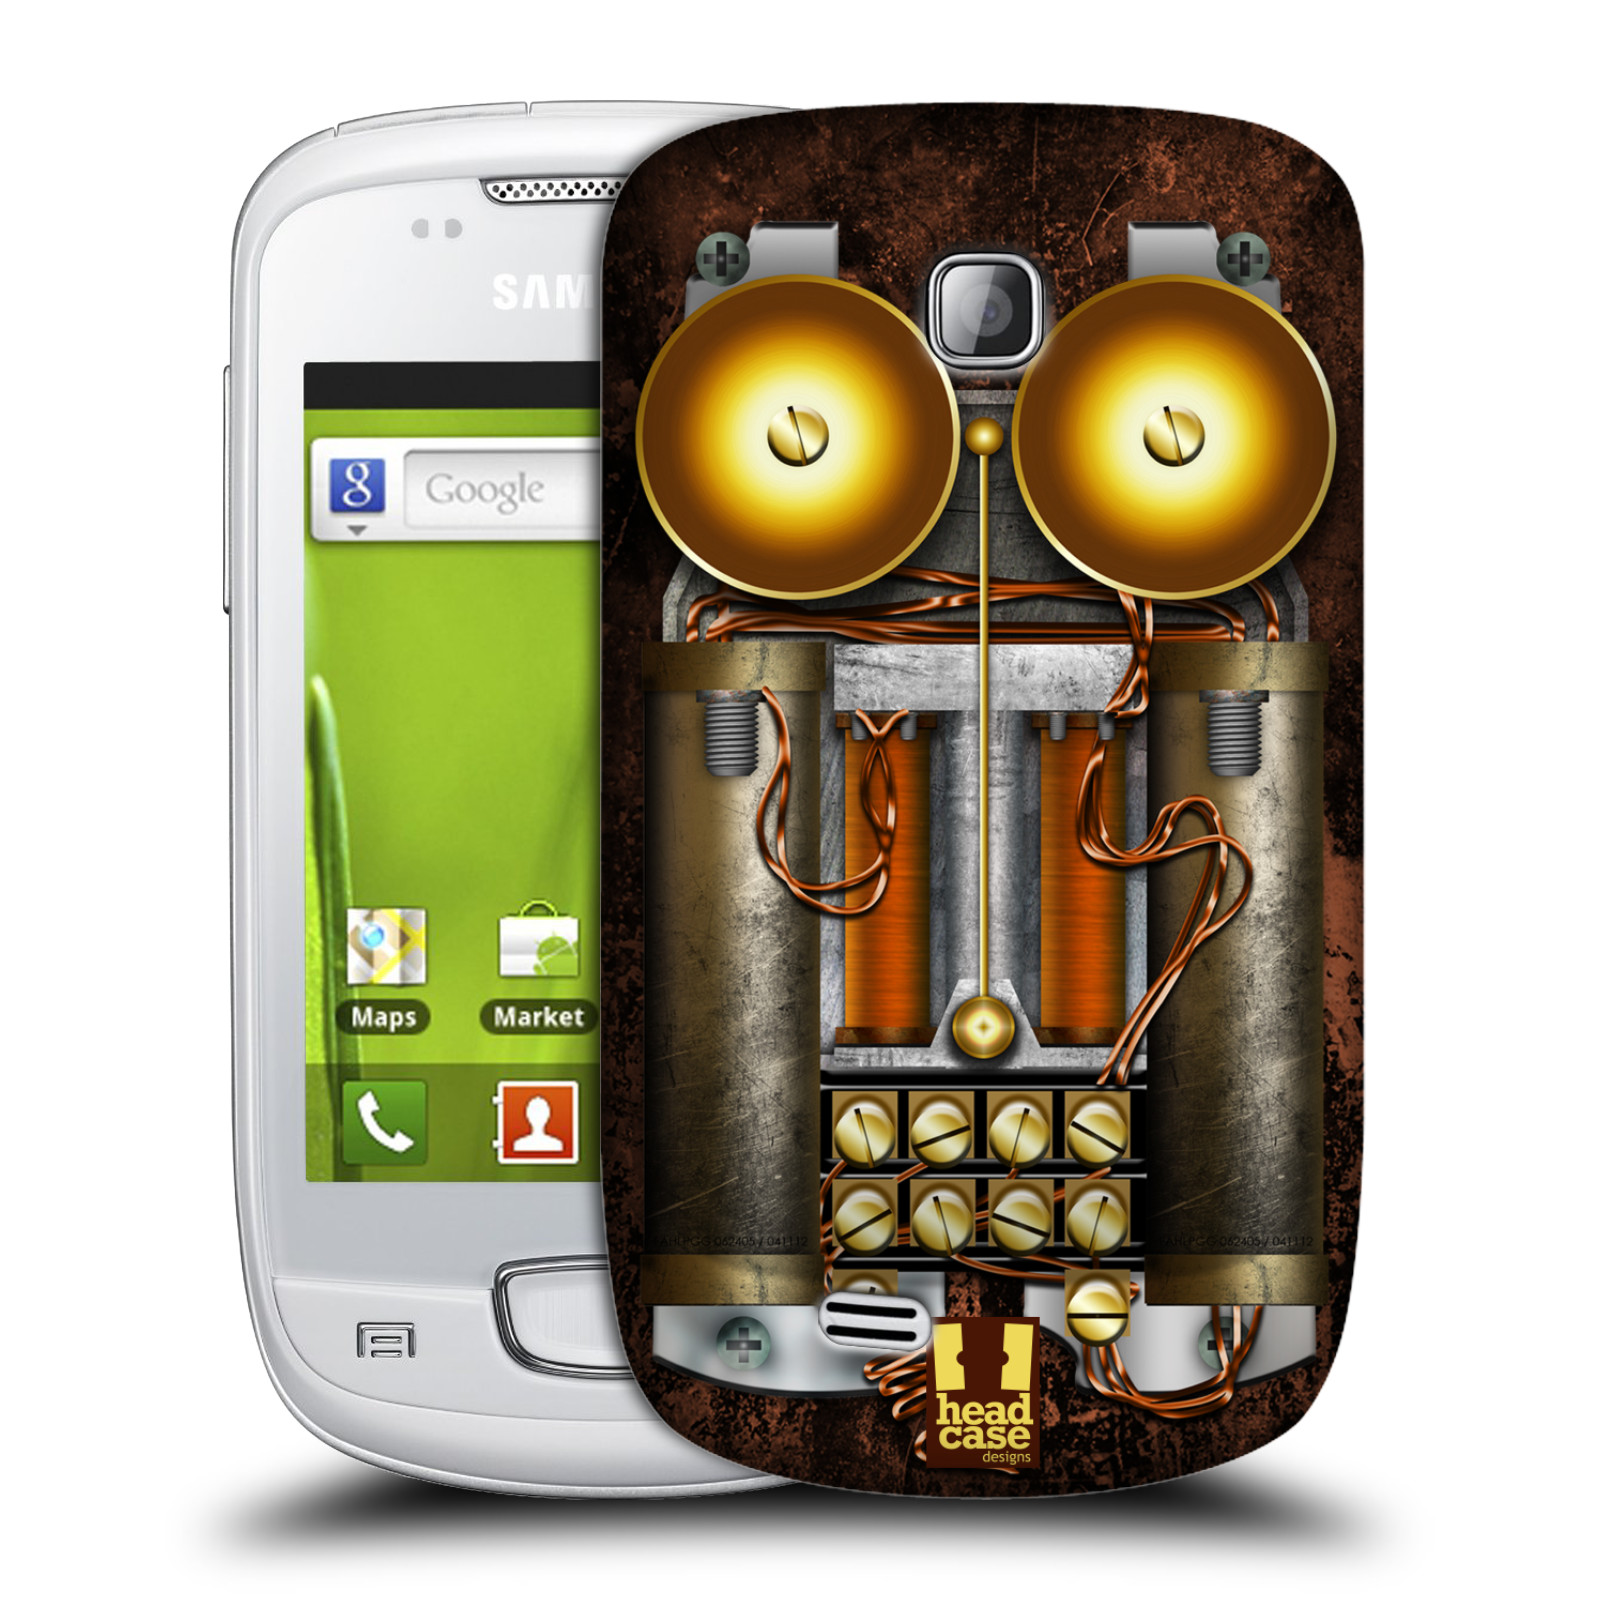 Plastové pouzdro na mobil Samsung Galaxy Mini HEAD CASE STEAMPUNK TELEFON (Kryt či obal na mobilní telefon Samsung Galaxy Mini GT-S5570 / GT-S5570i)